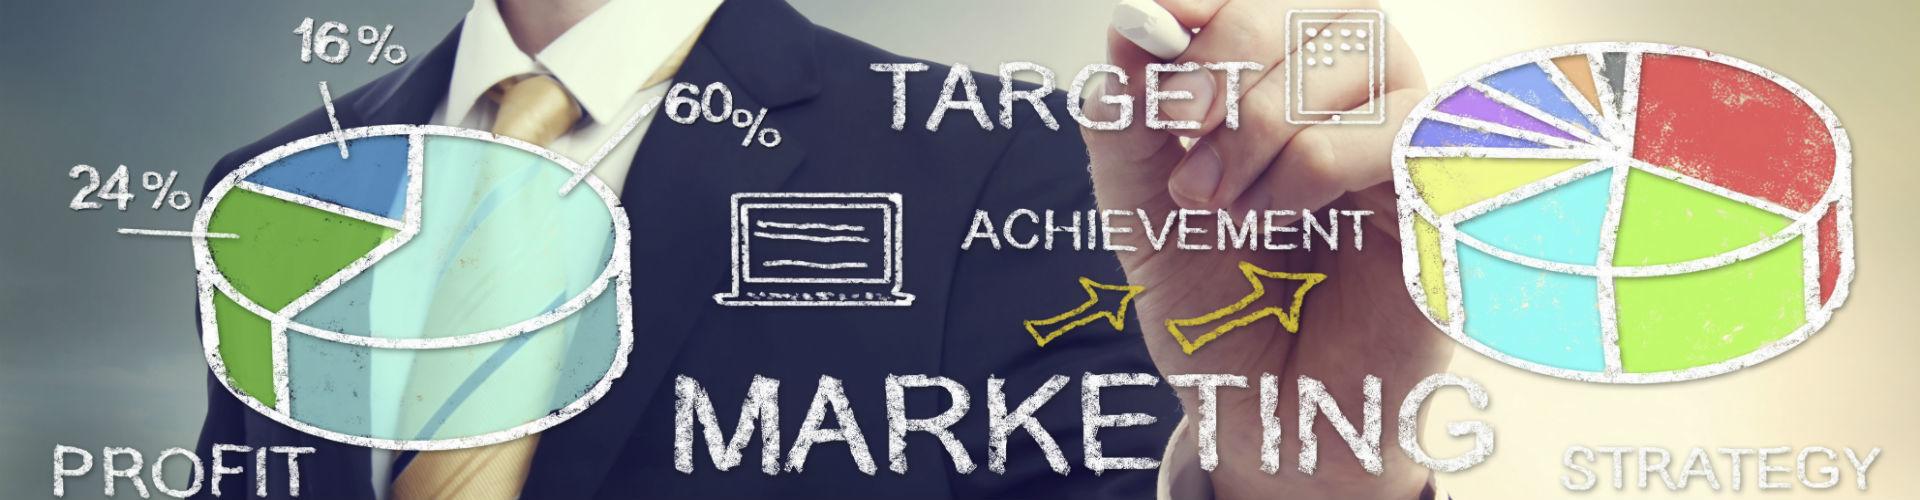 Marketing kép